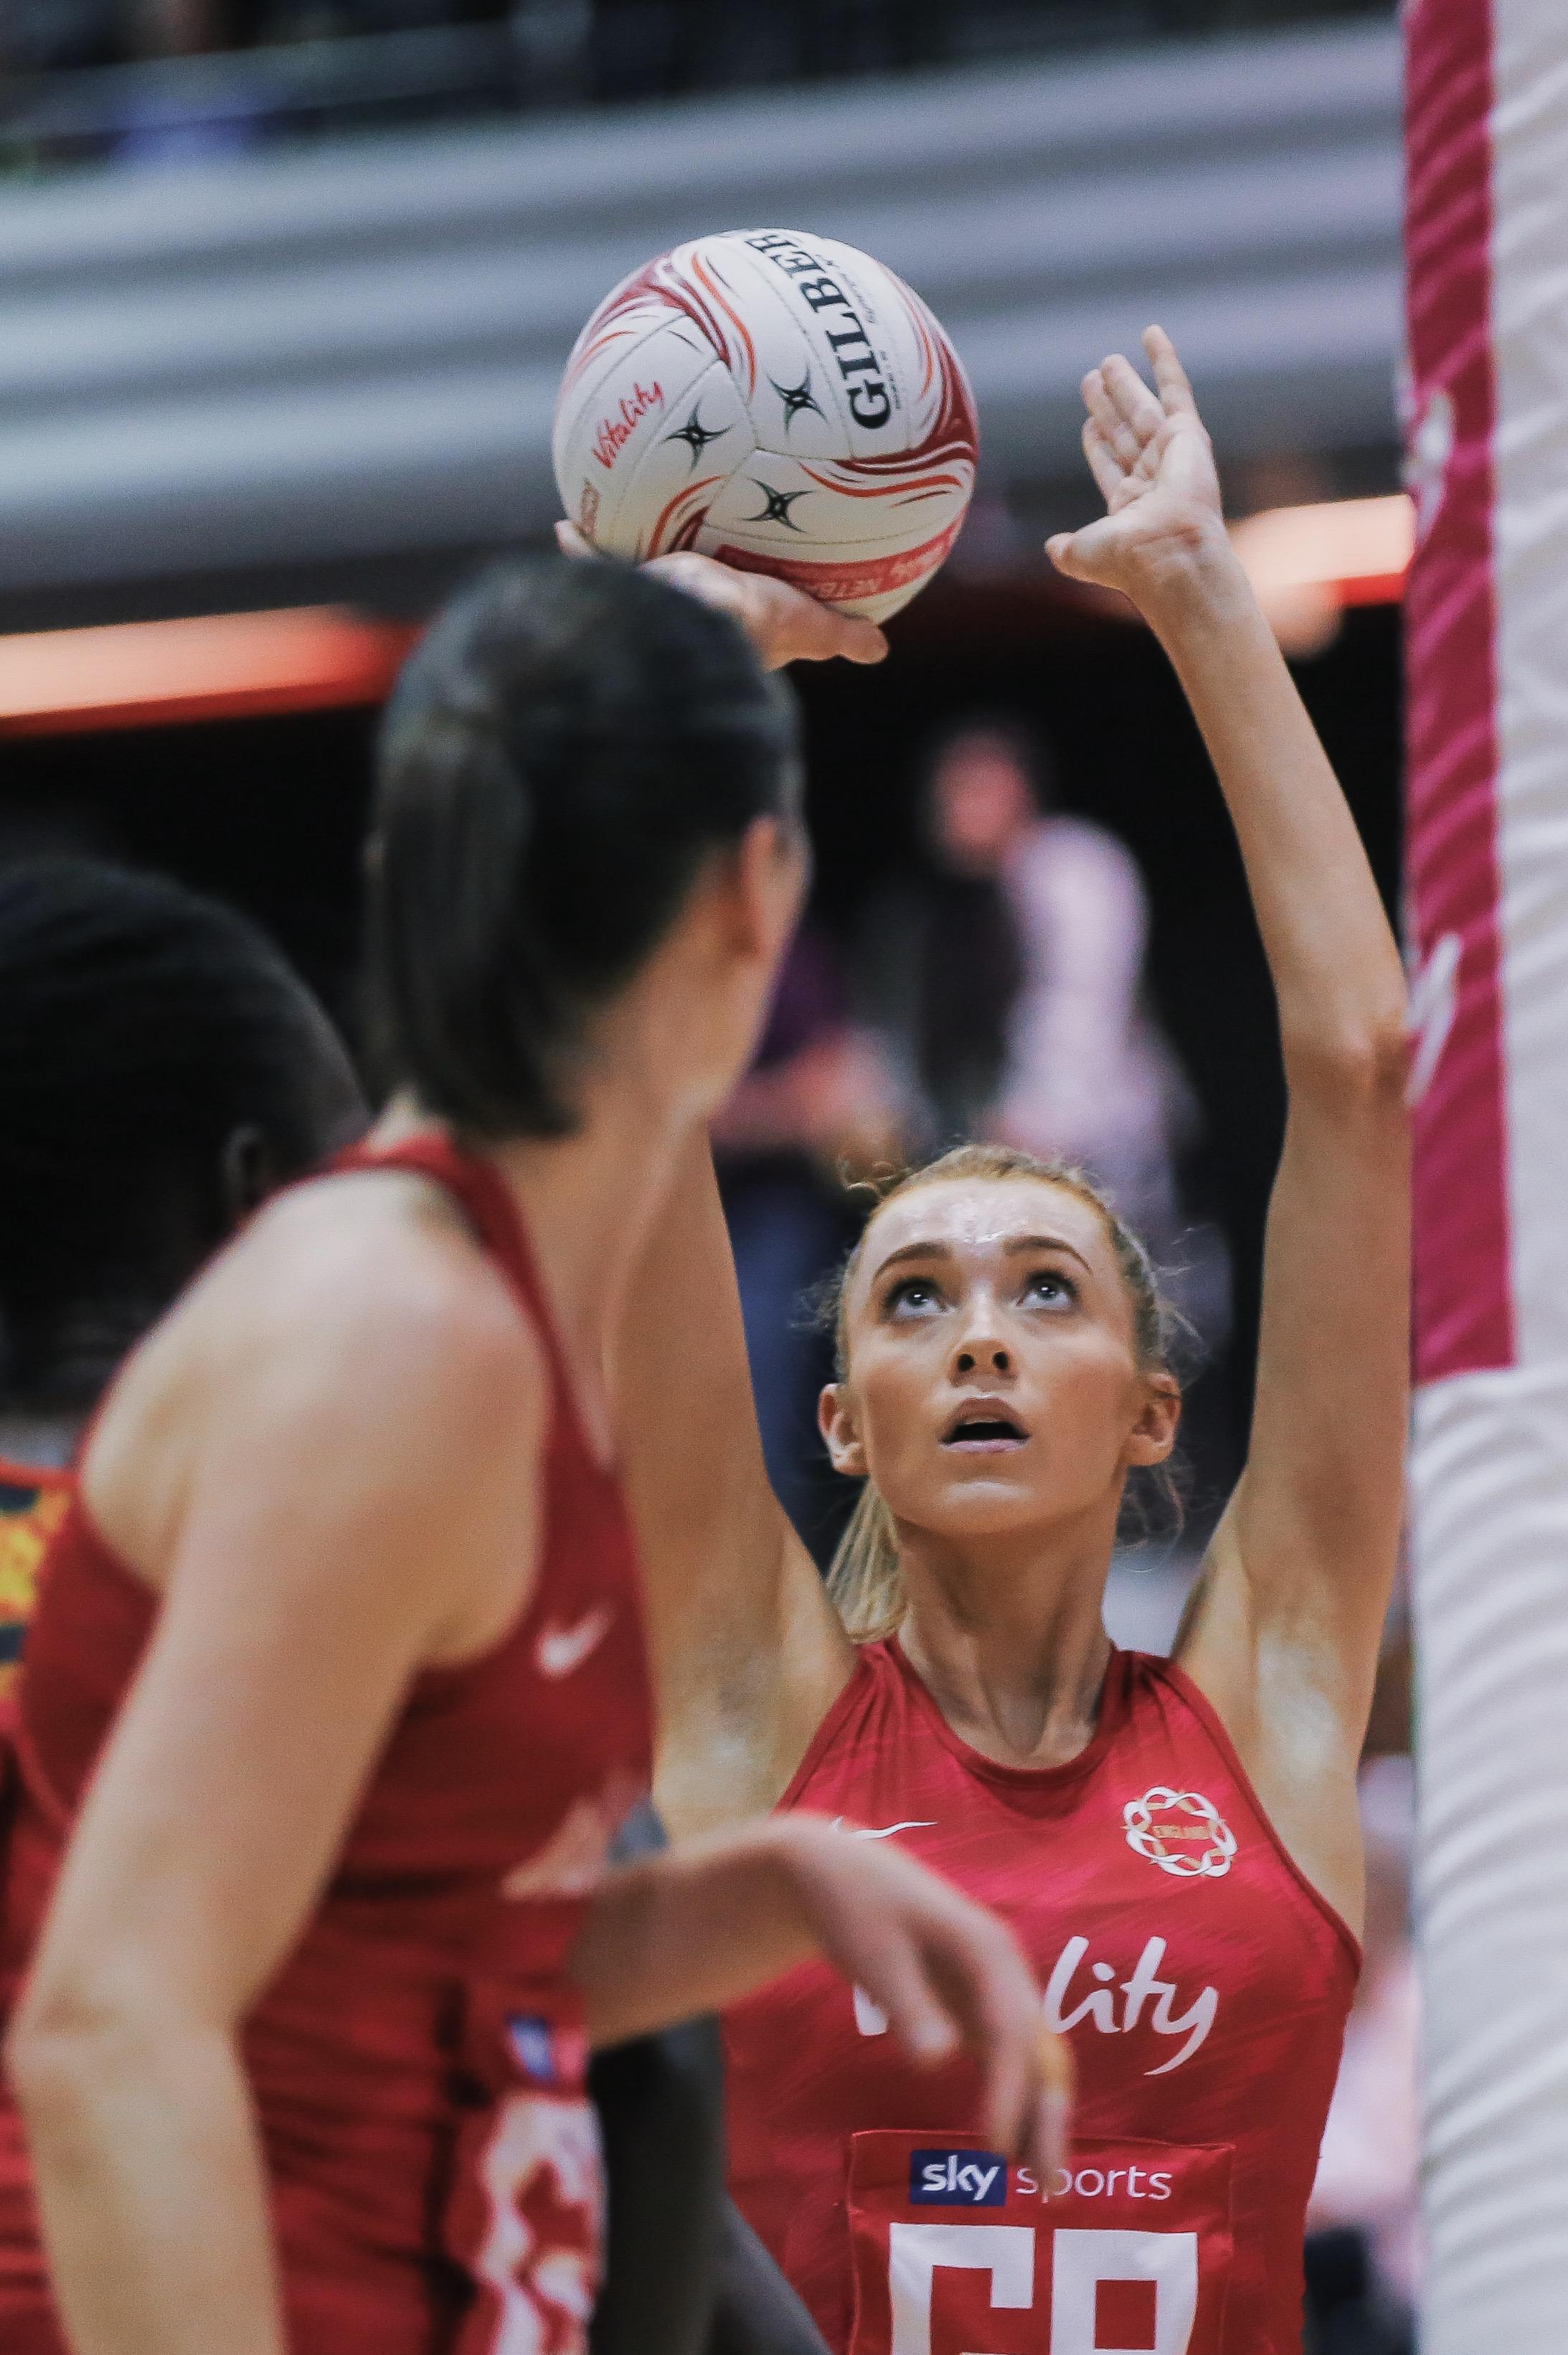 womens-netball-sport-england-uganda-international-series-21.jpg